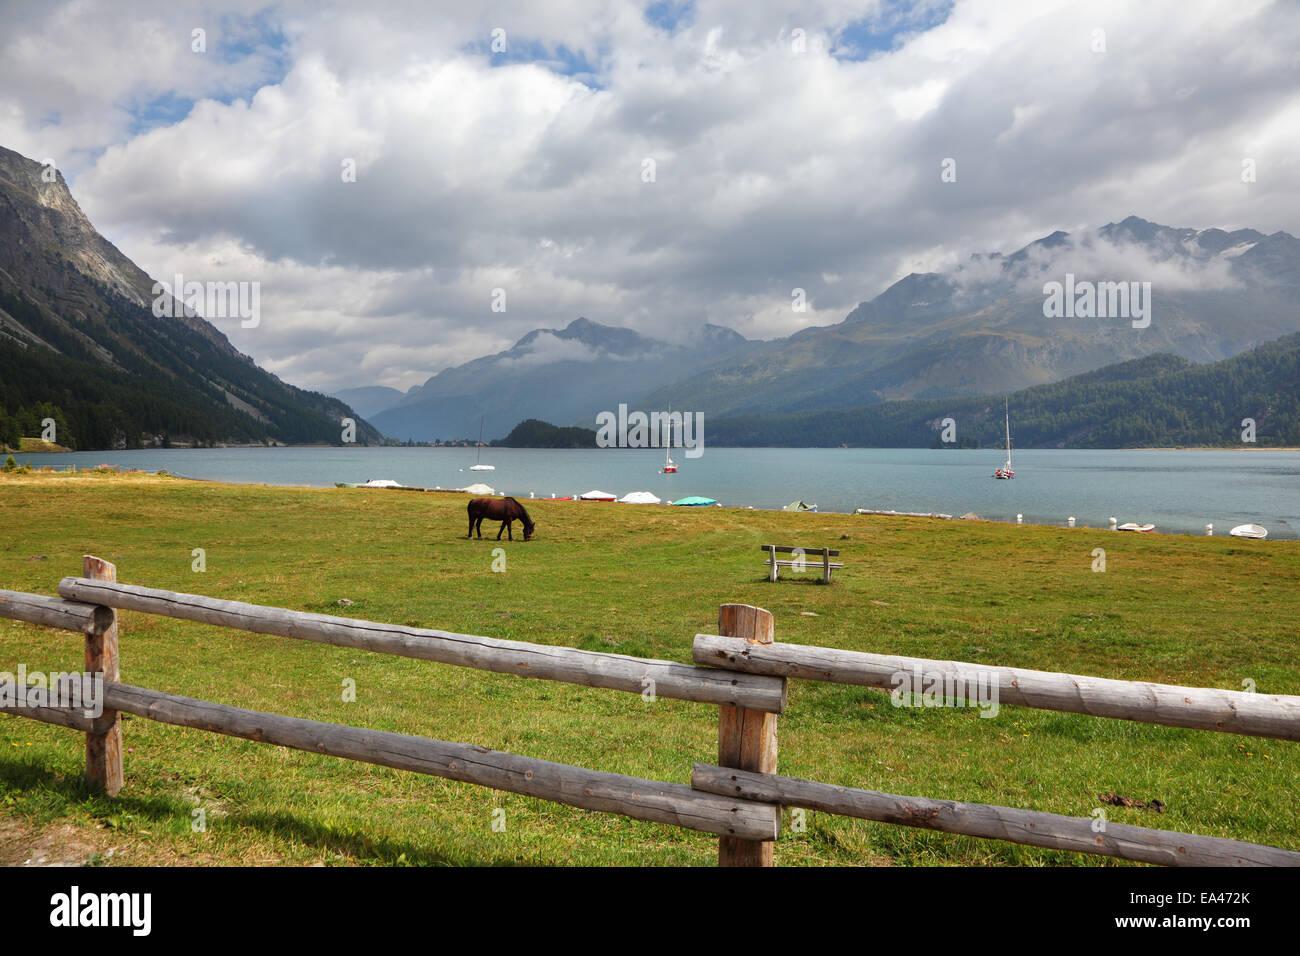 Sleek bay horse - Stock Image